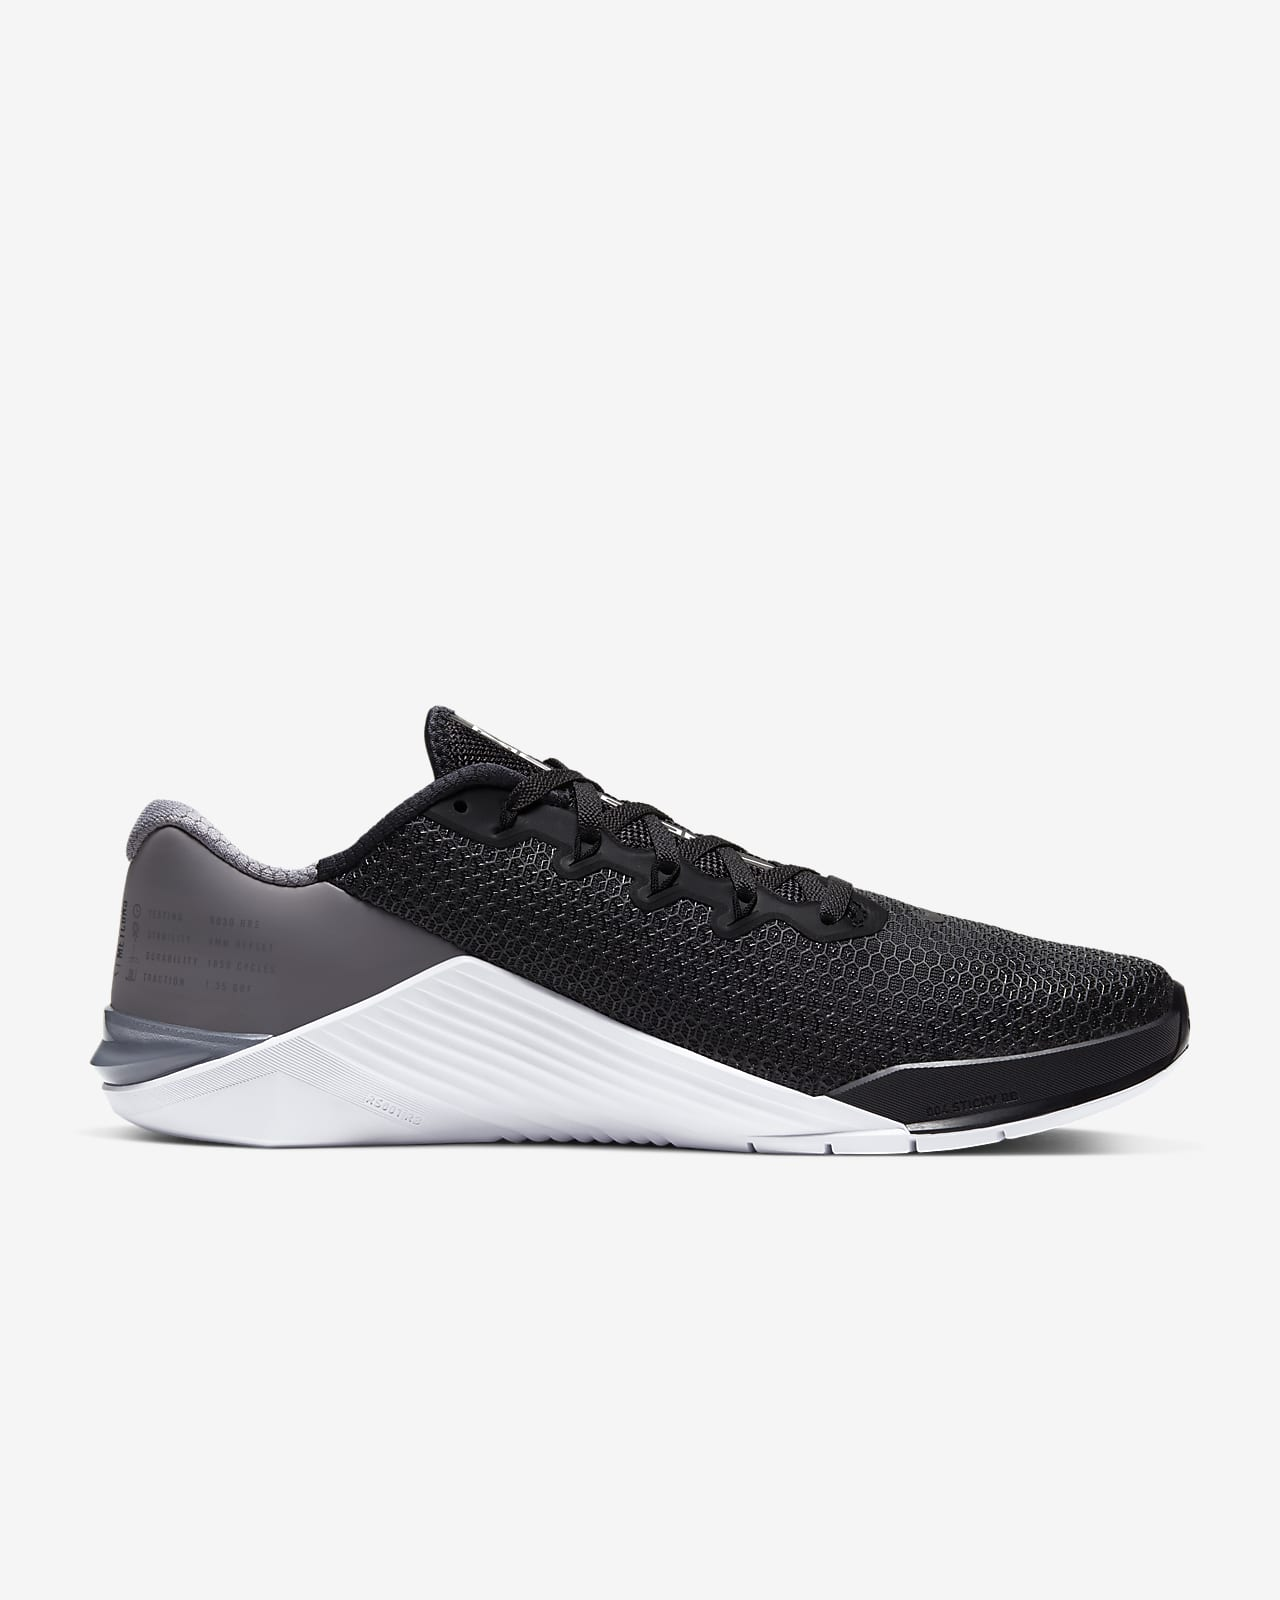 raya Hola Ambiguo  Nike Metcon 5 Men's Training Shoe. Nike.com